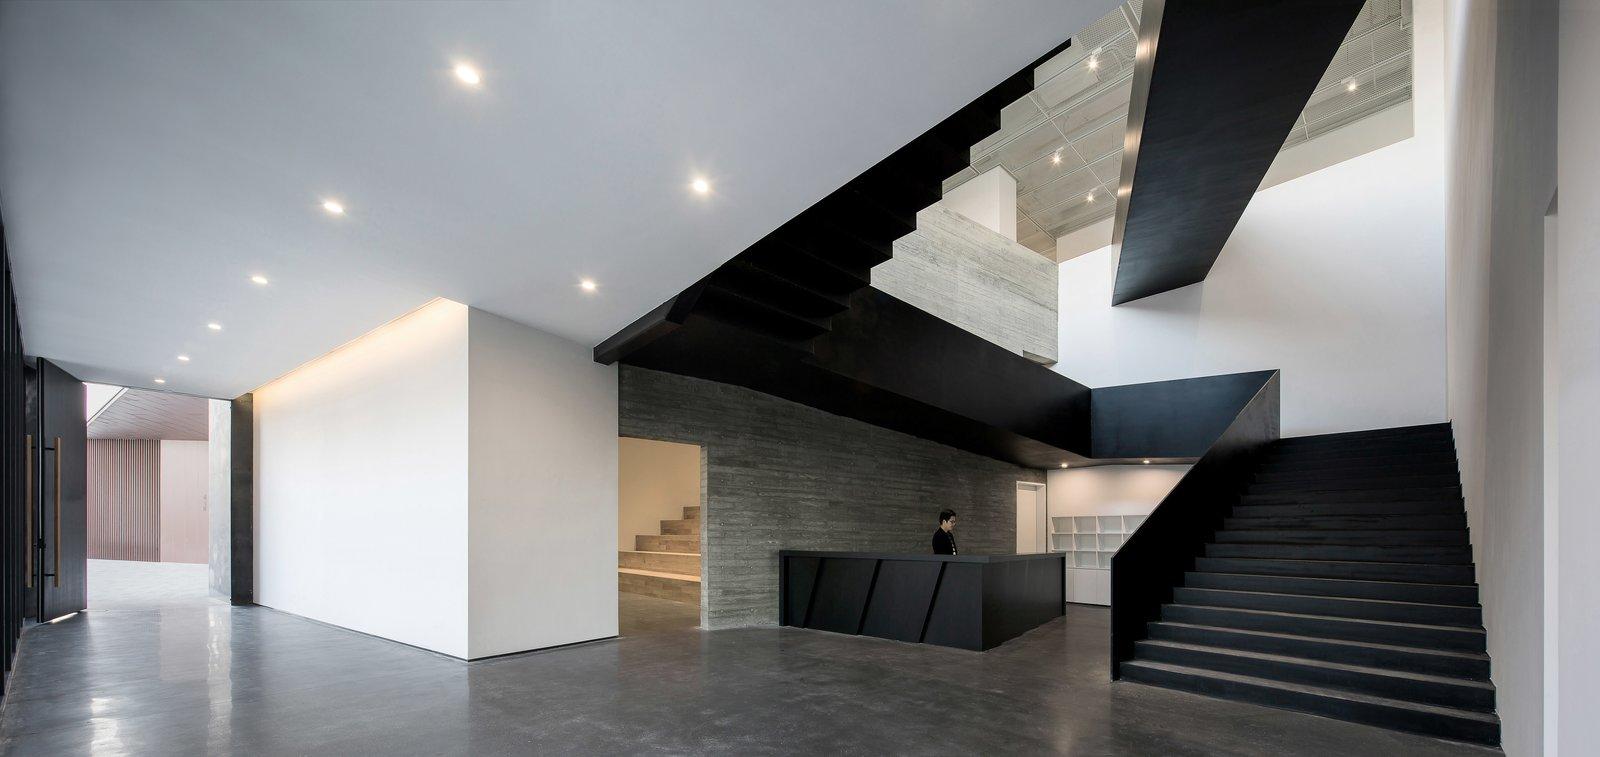 Foyer and atrium  ZHI ART MUSEUM